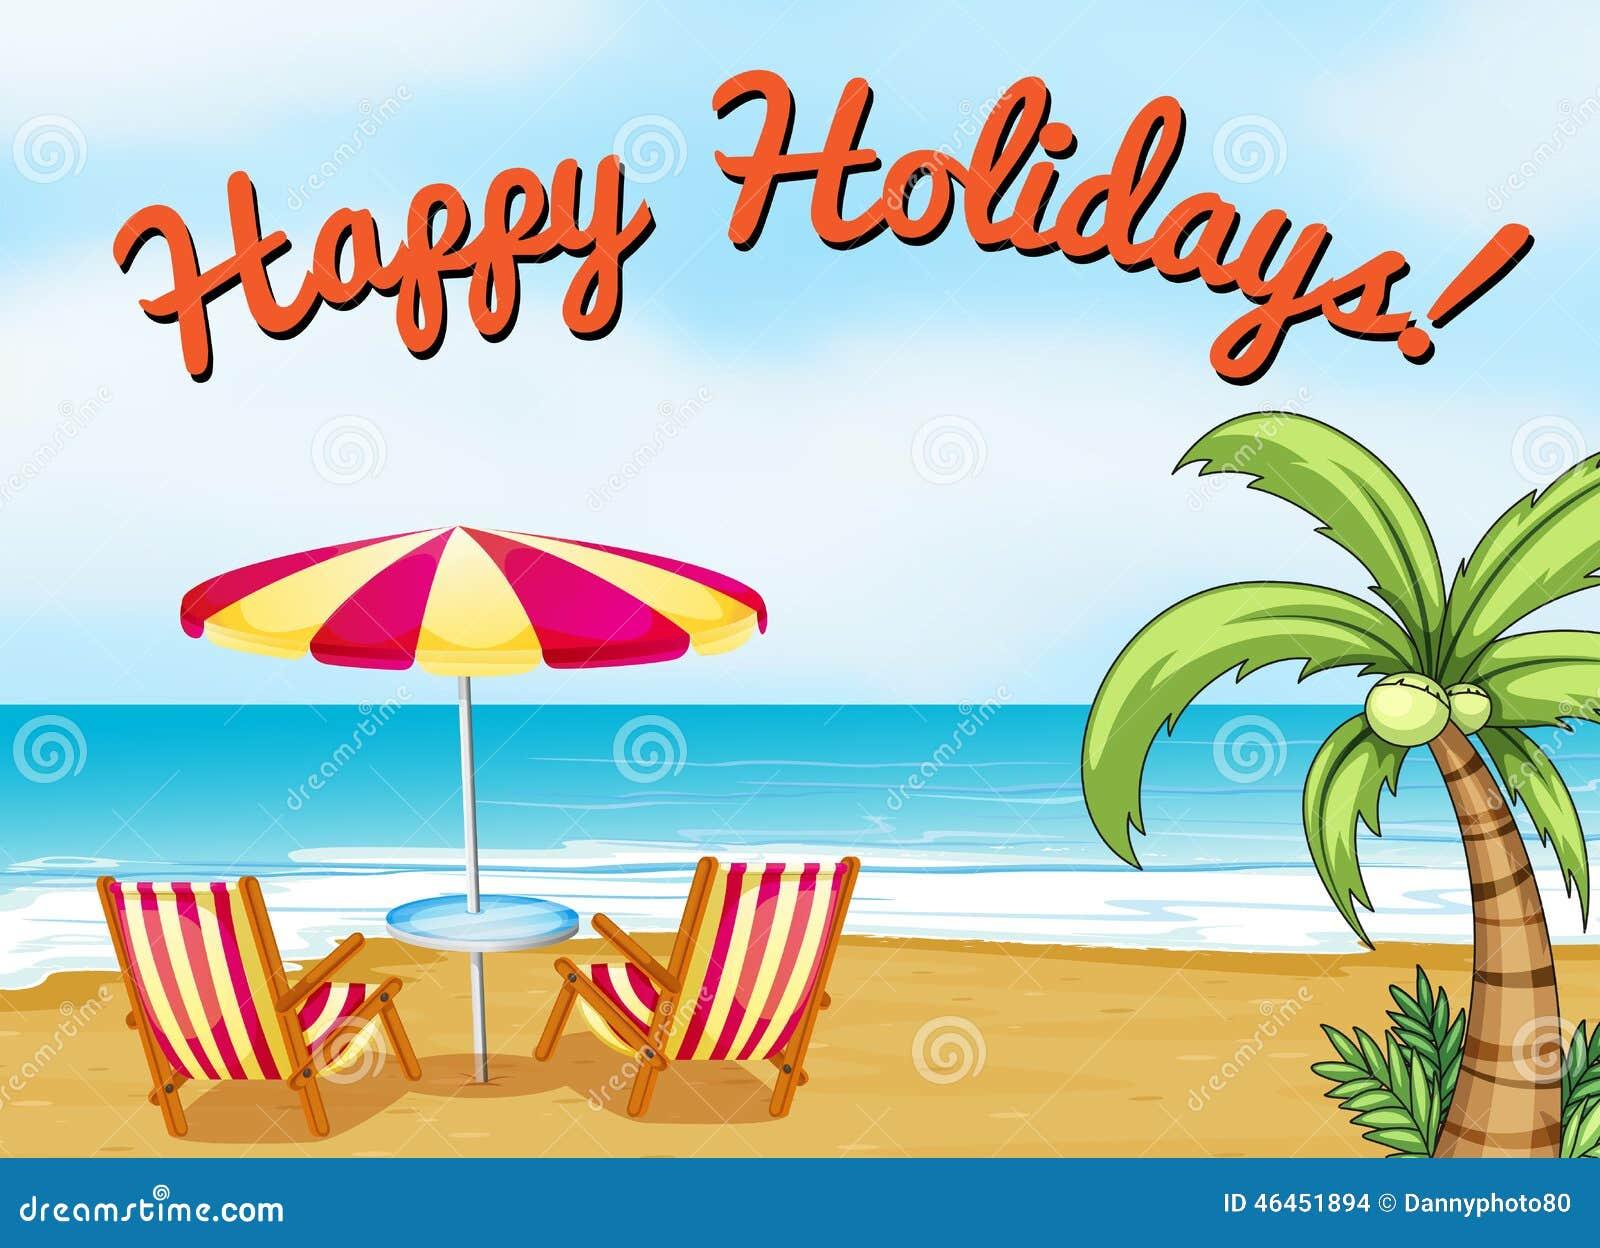 Happy Holidays Stock Vector - Image: 46451894